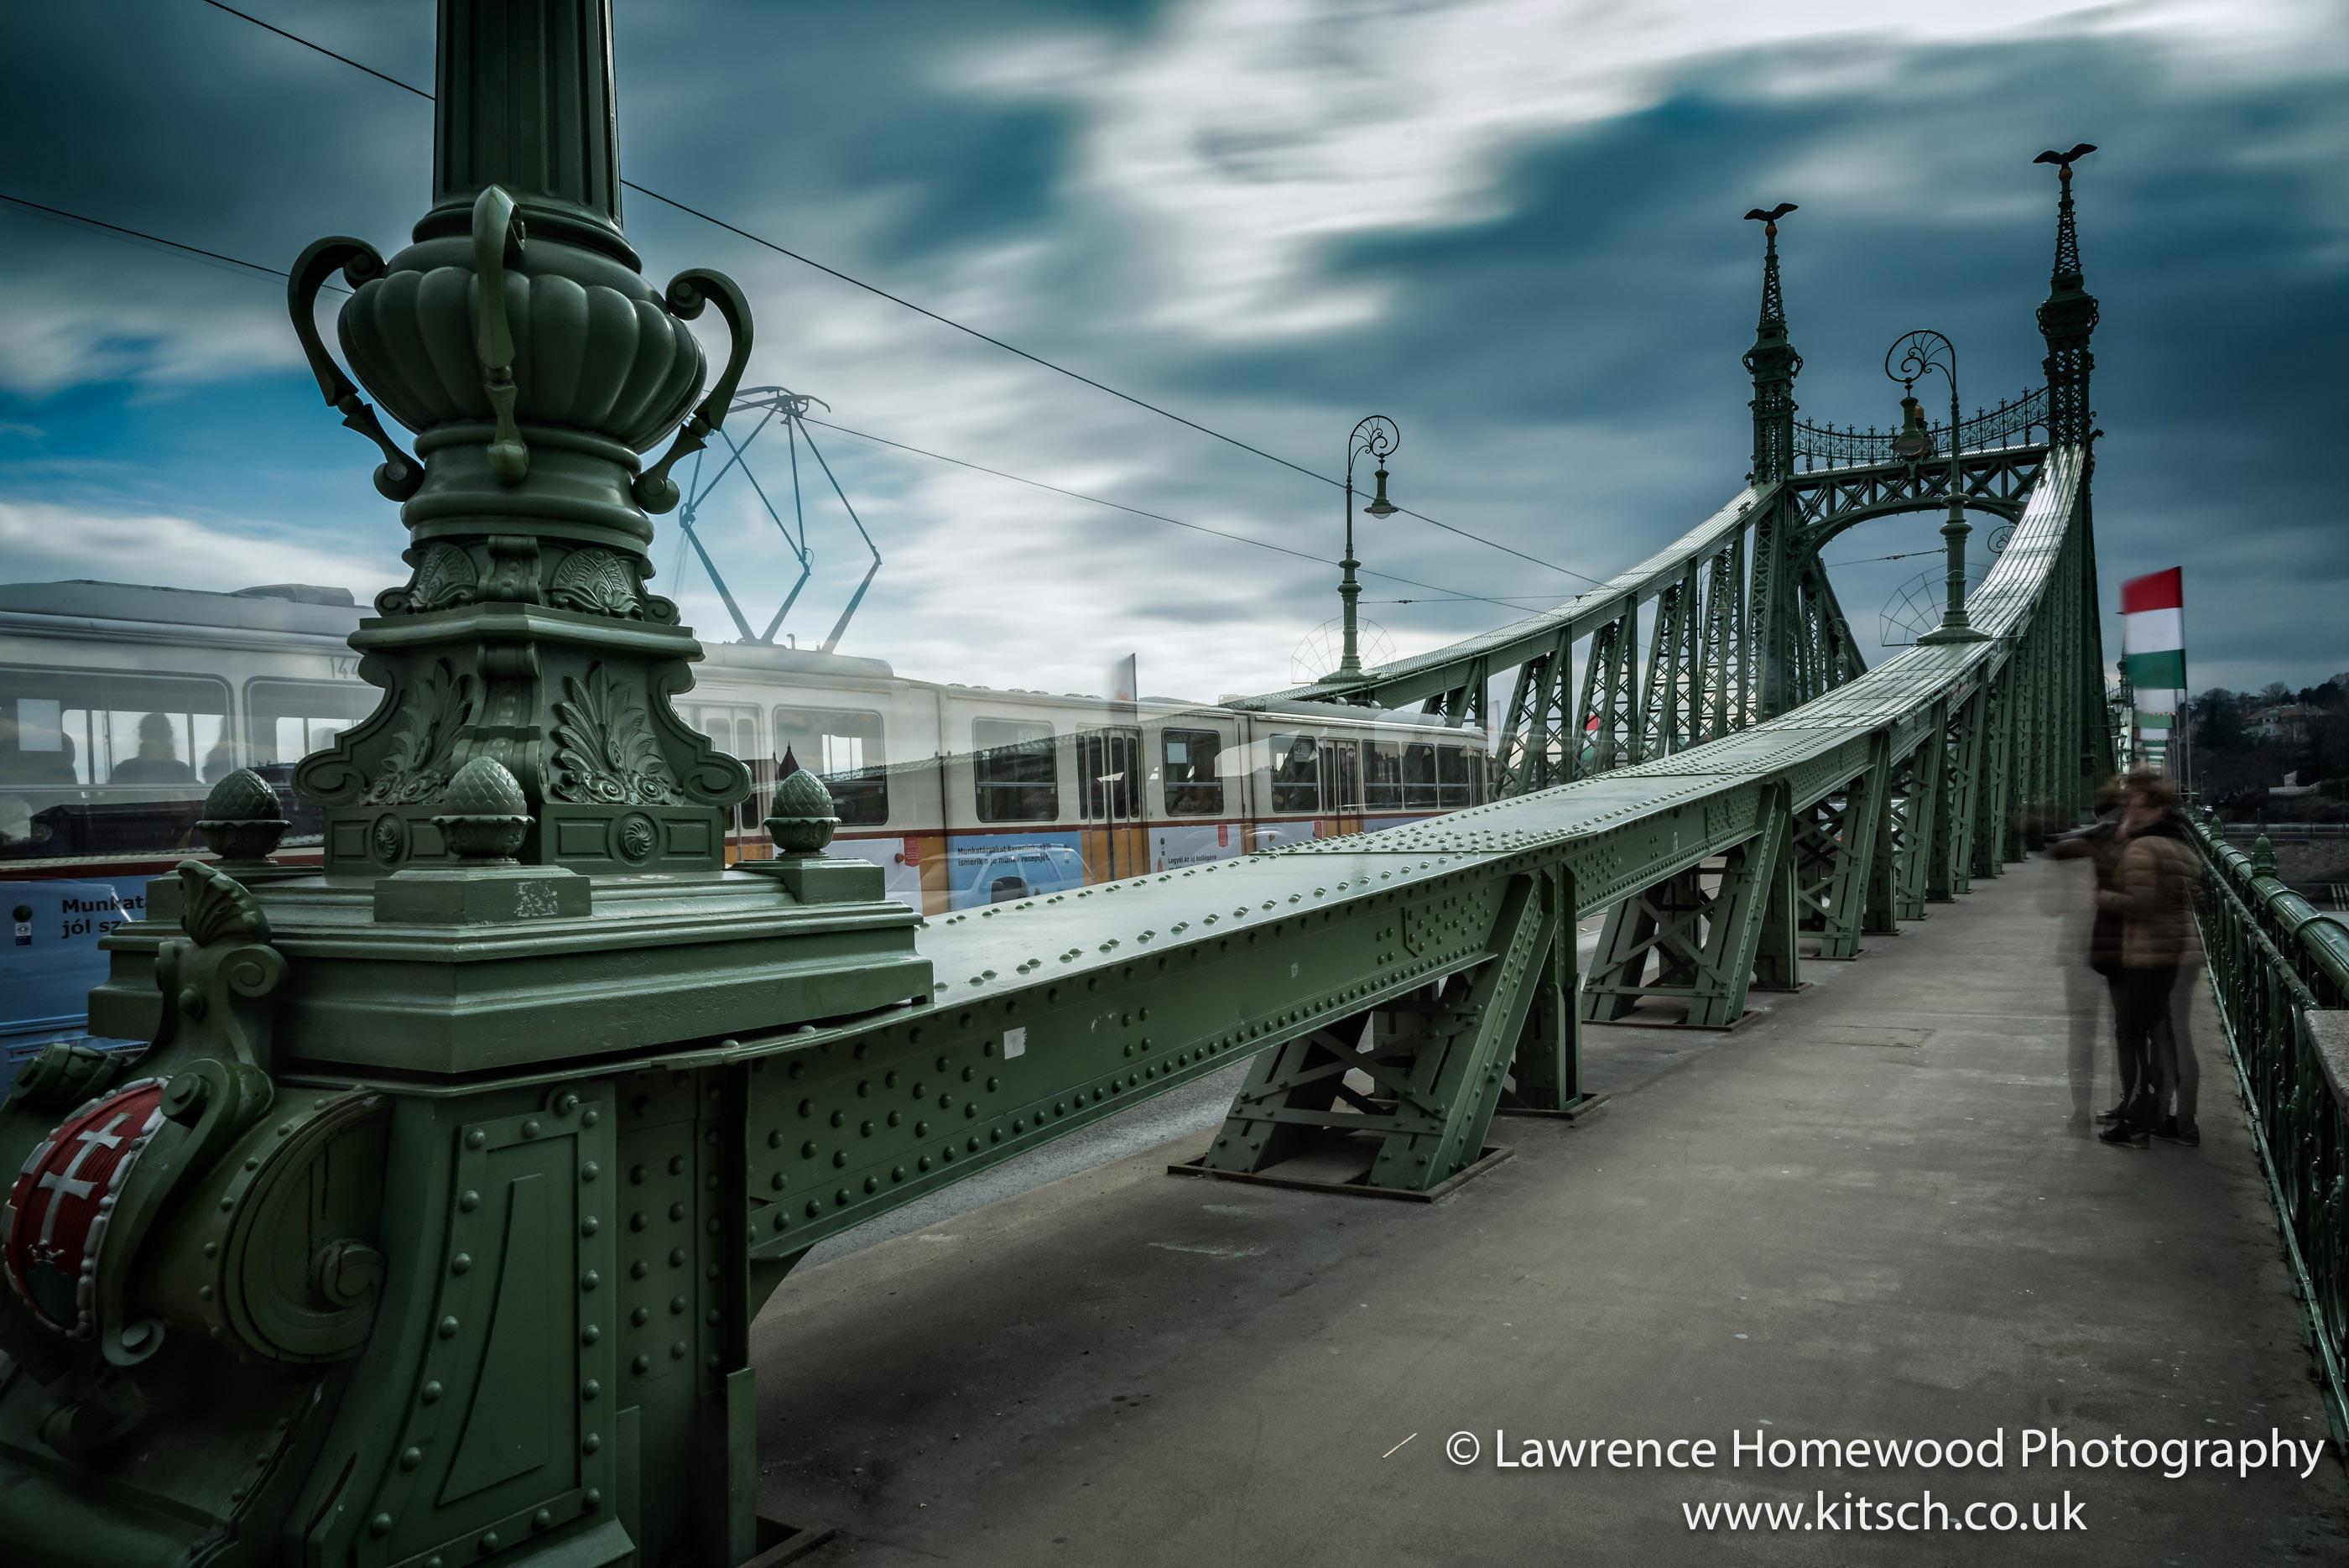 Franz Joseph Bridge Motion in Motion